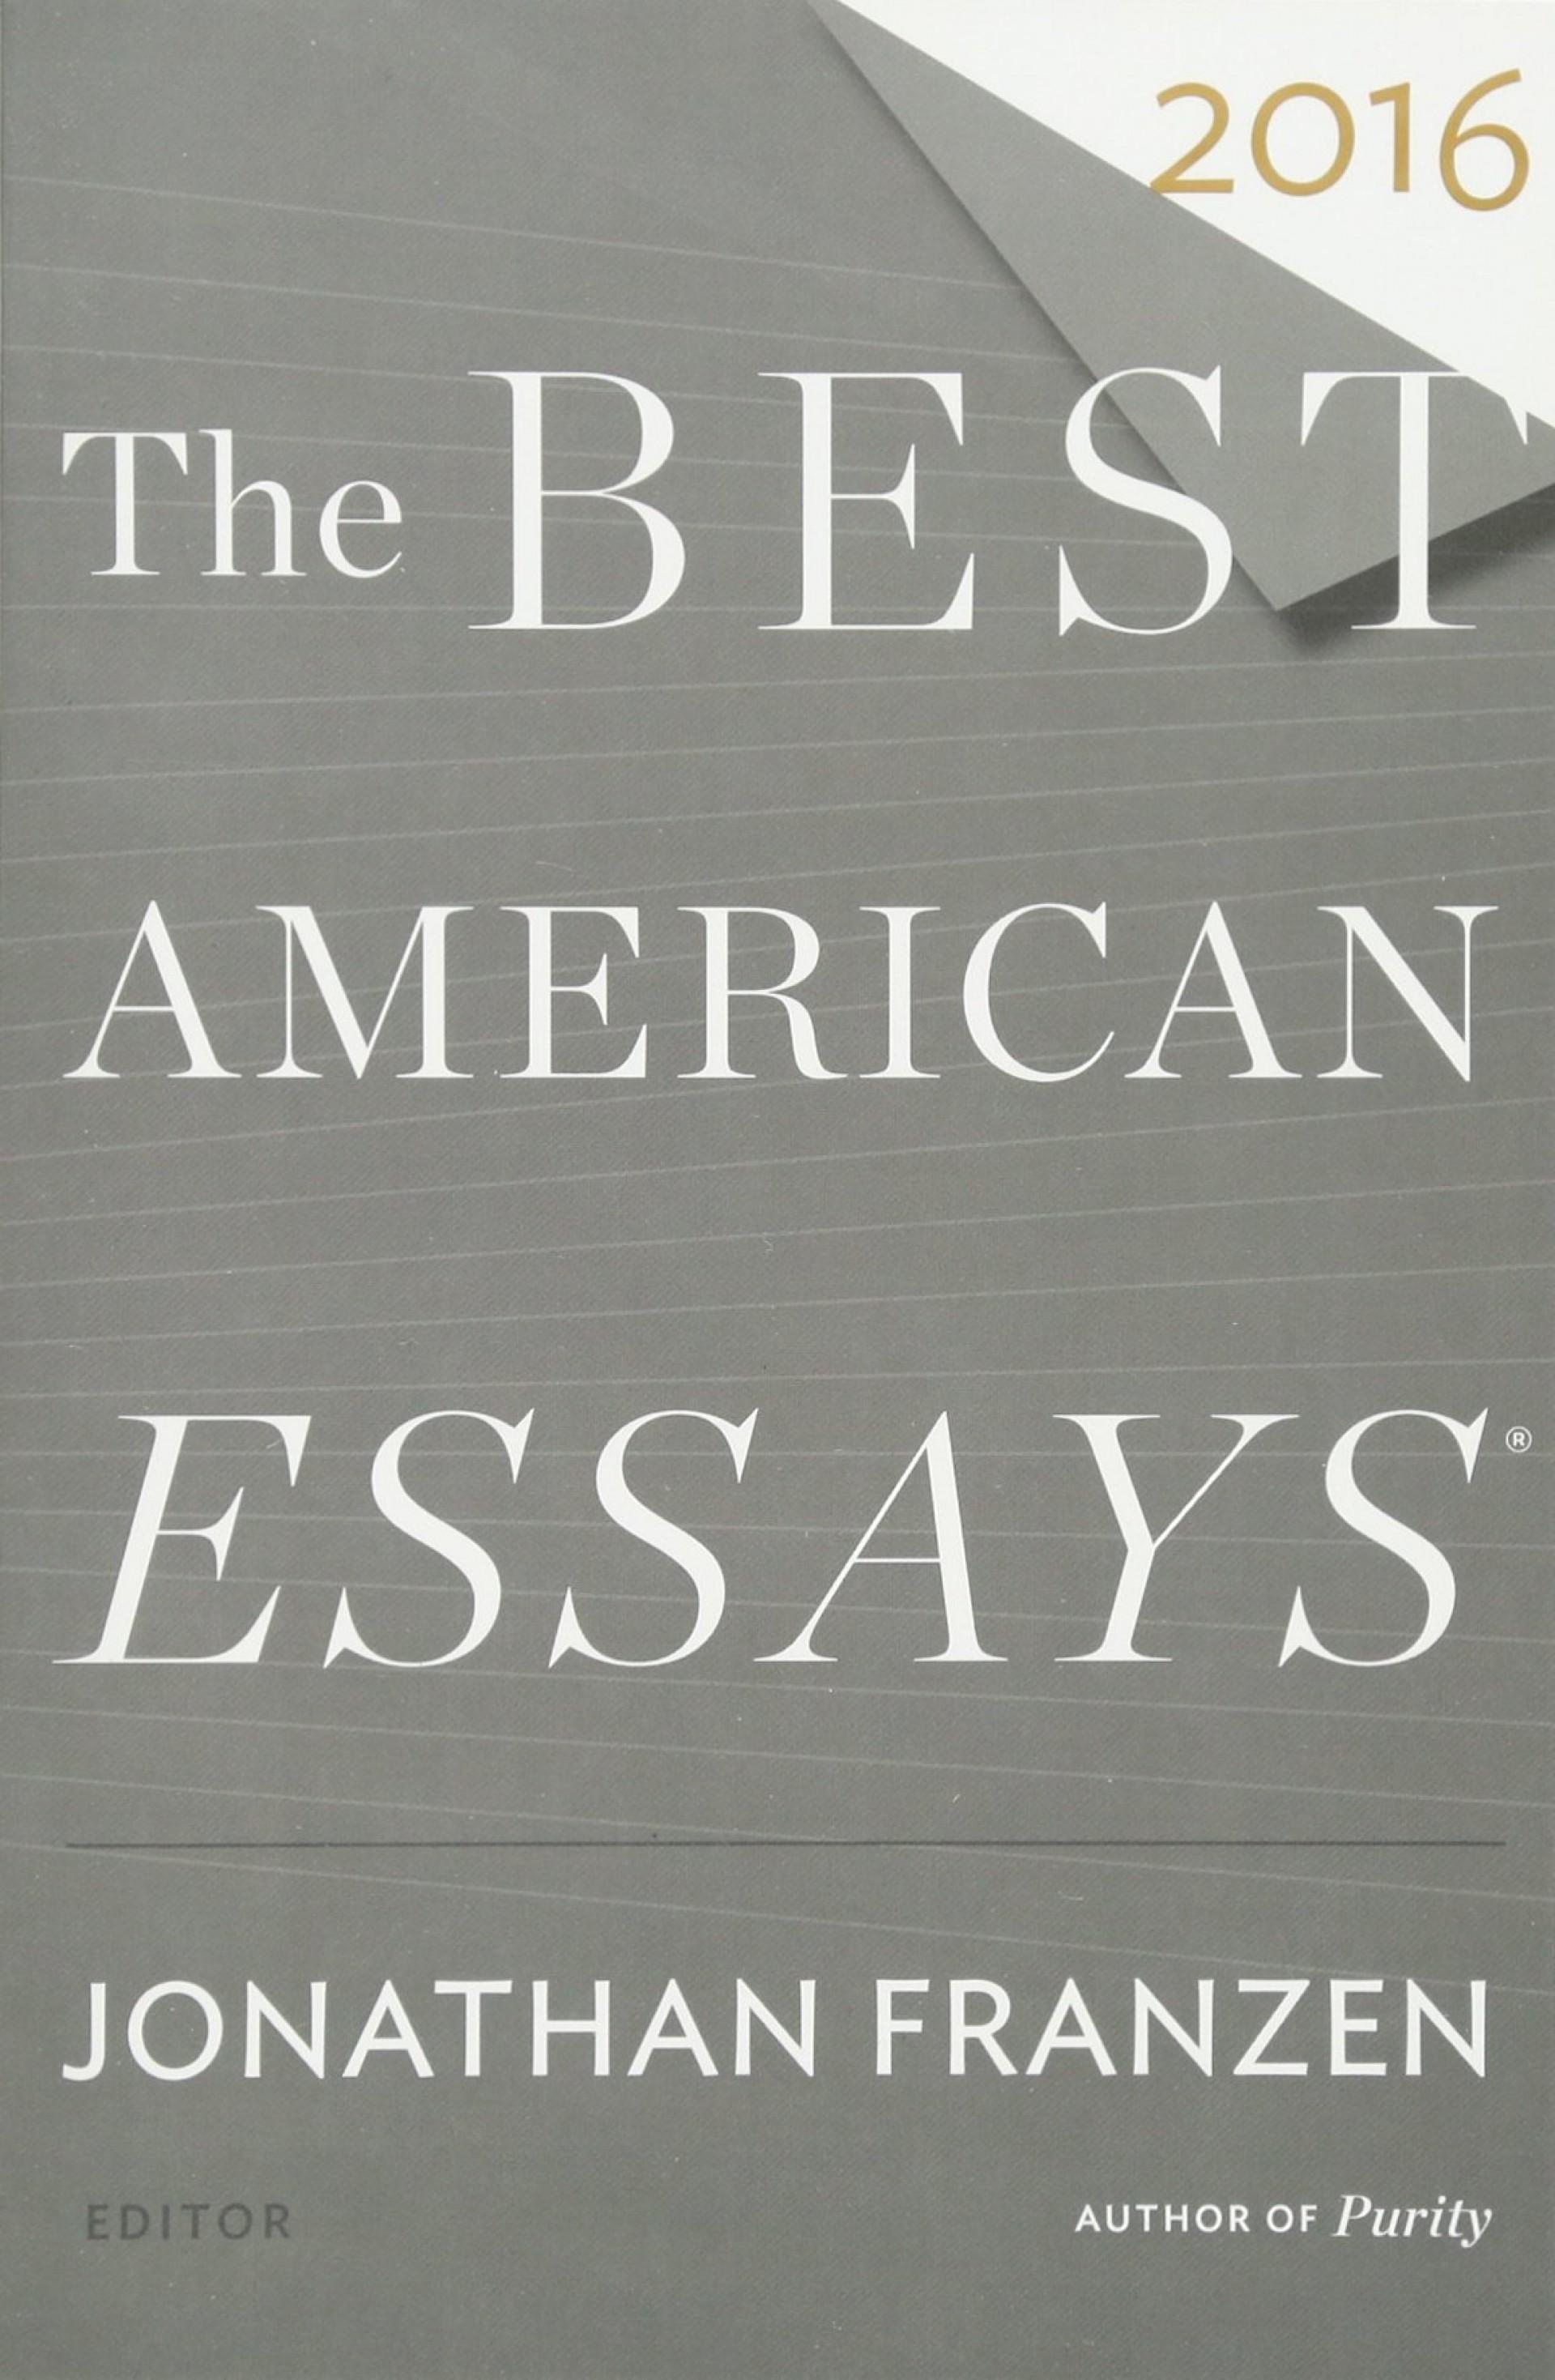 001 71a6bhsgsdl Essay Example Best American Essays Unique 2016 Notables The Free Pdf 1920